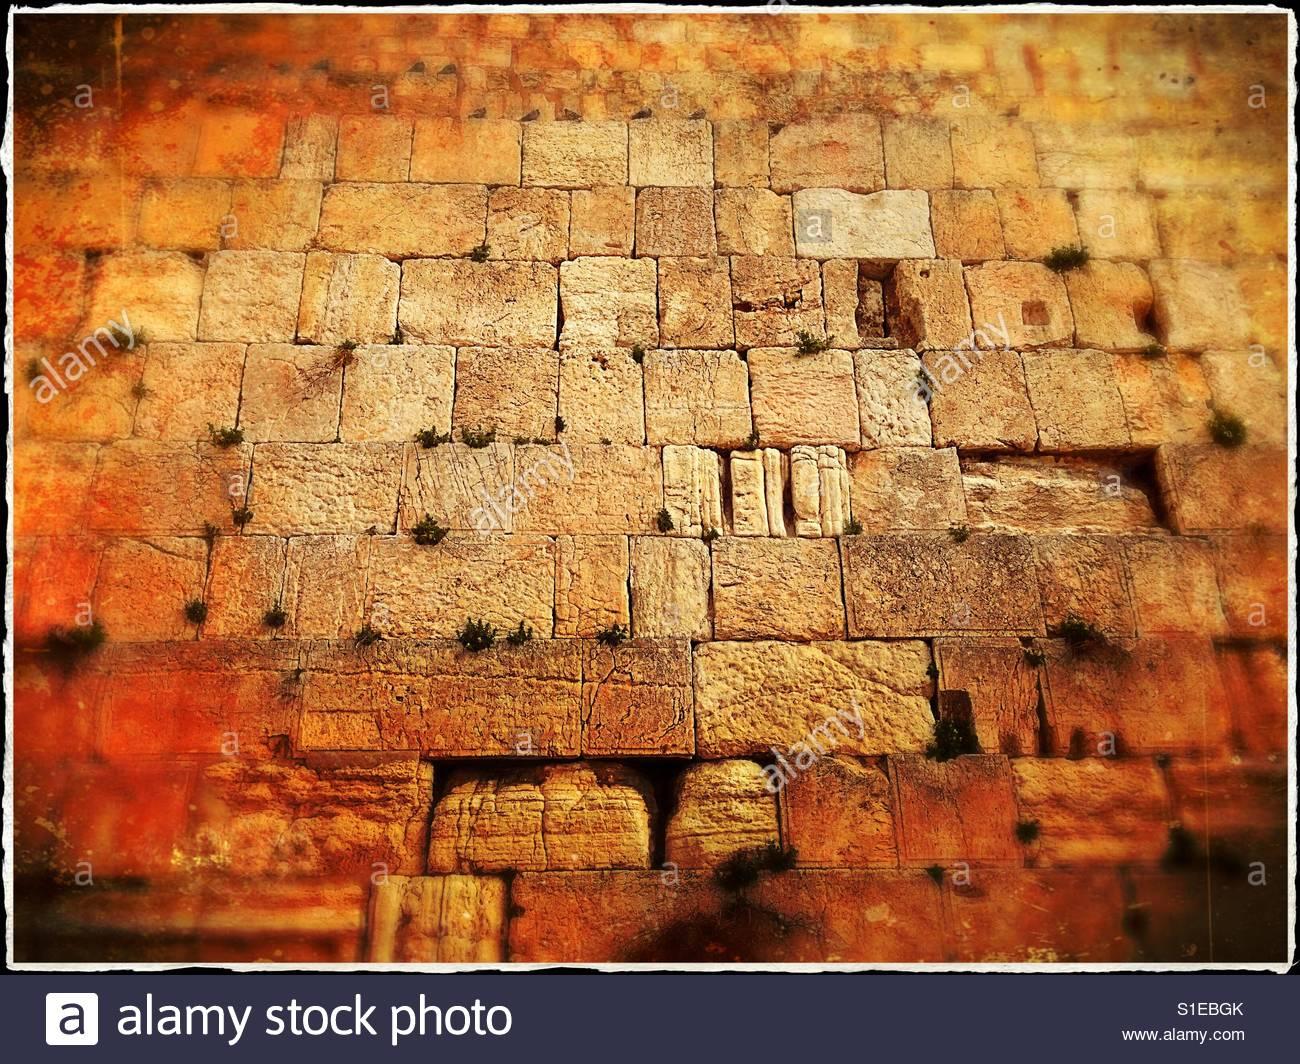 The Wailing Wall. Jerusalem, Israel. - Stock Image